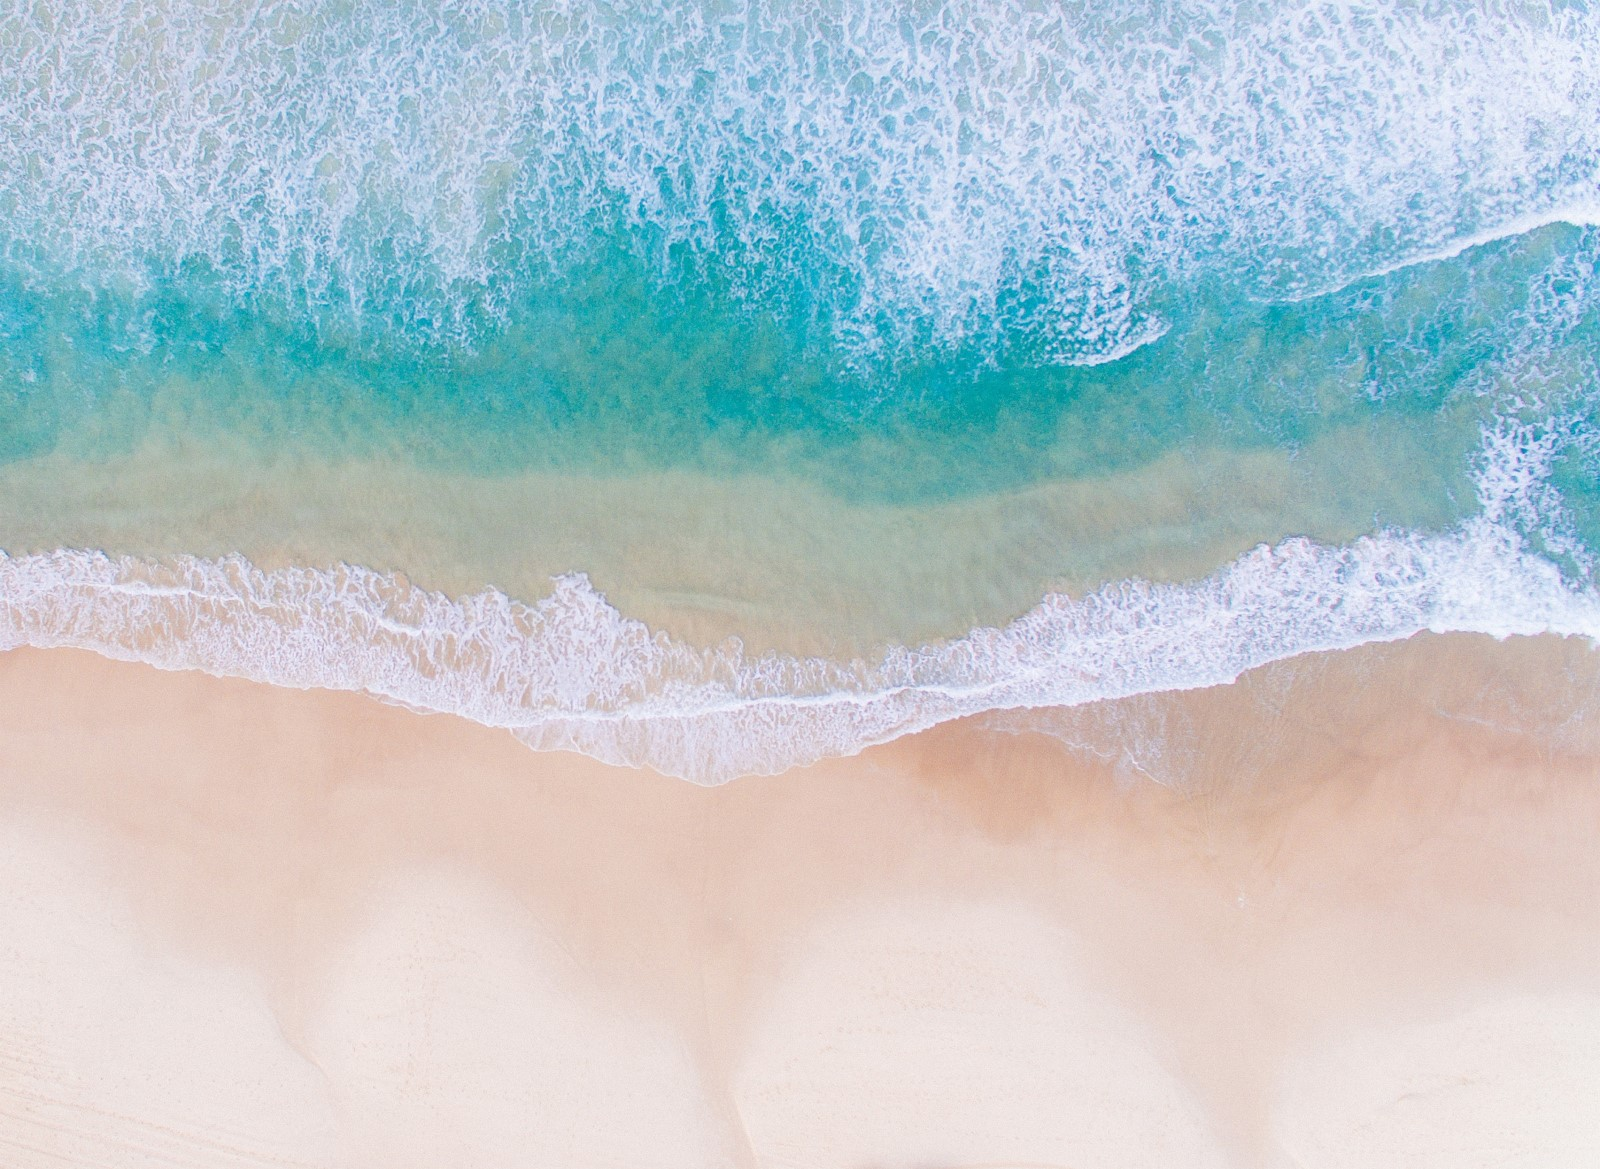 Nature - Bondi Beach, Australie